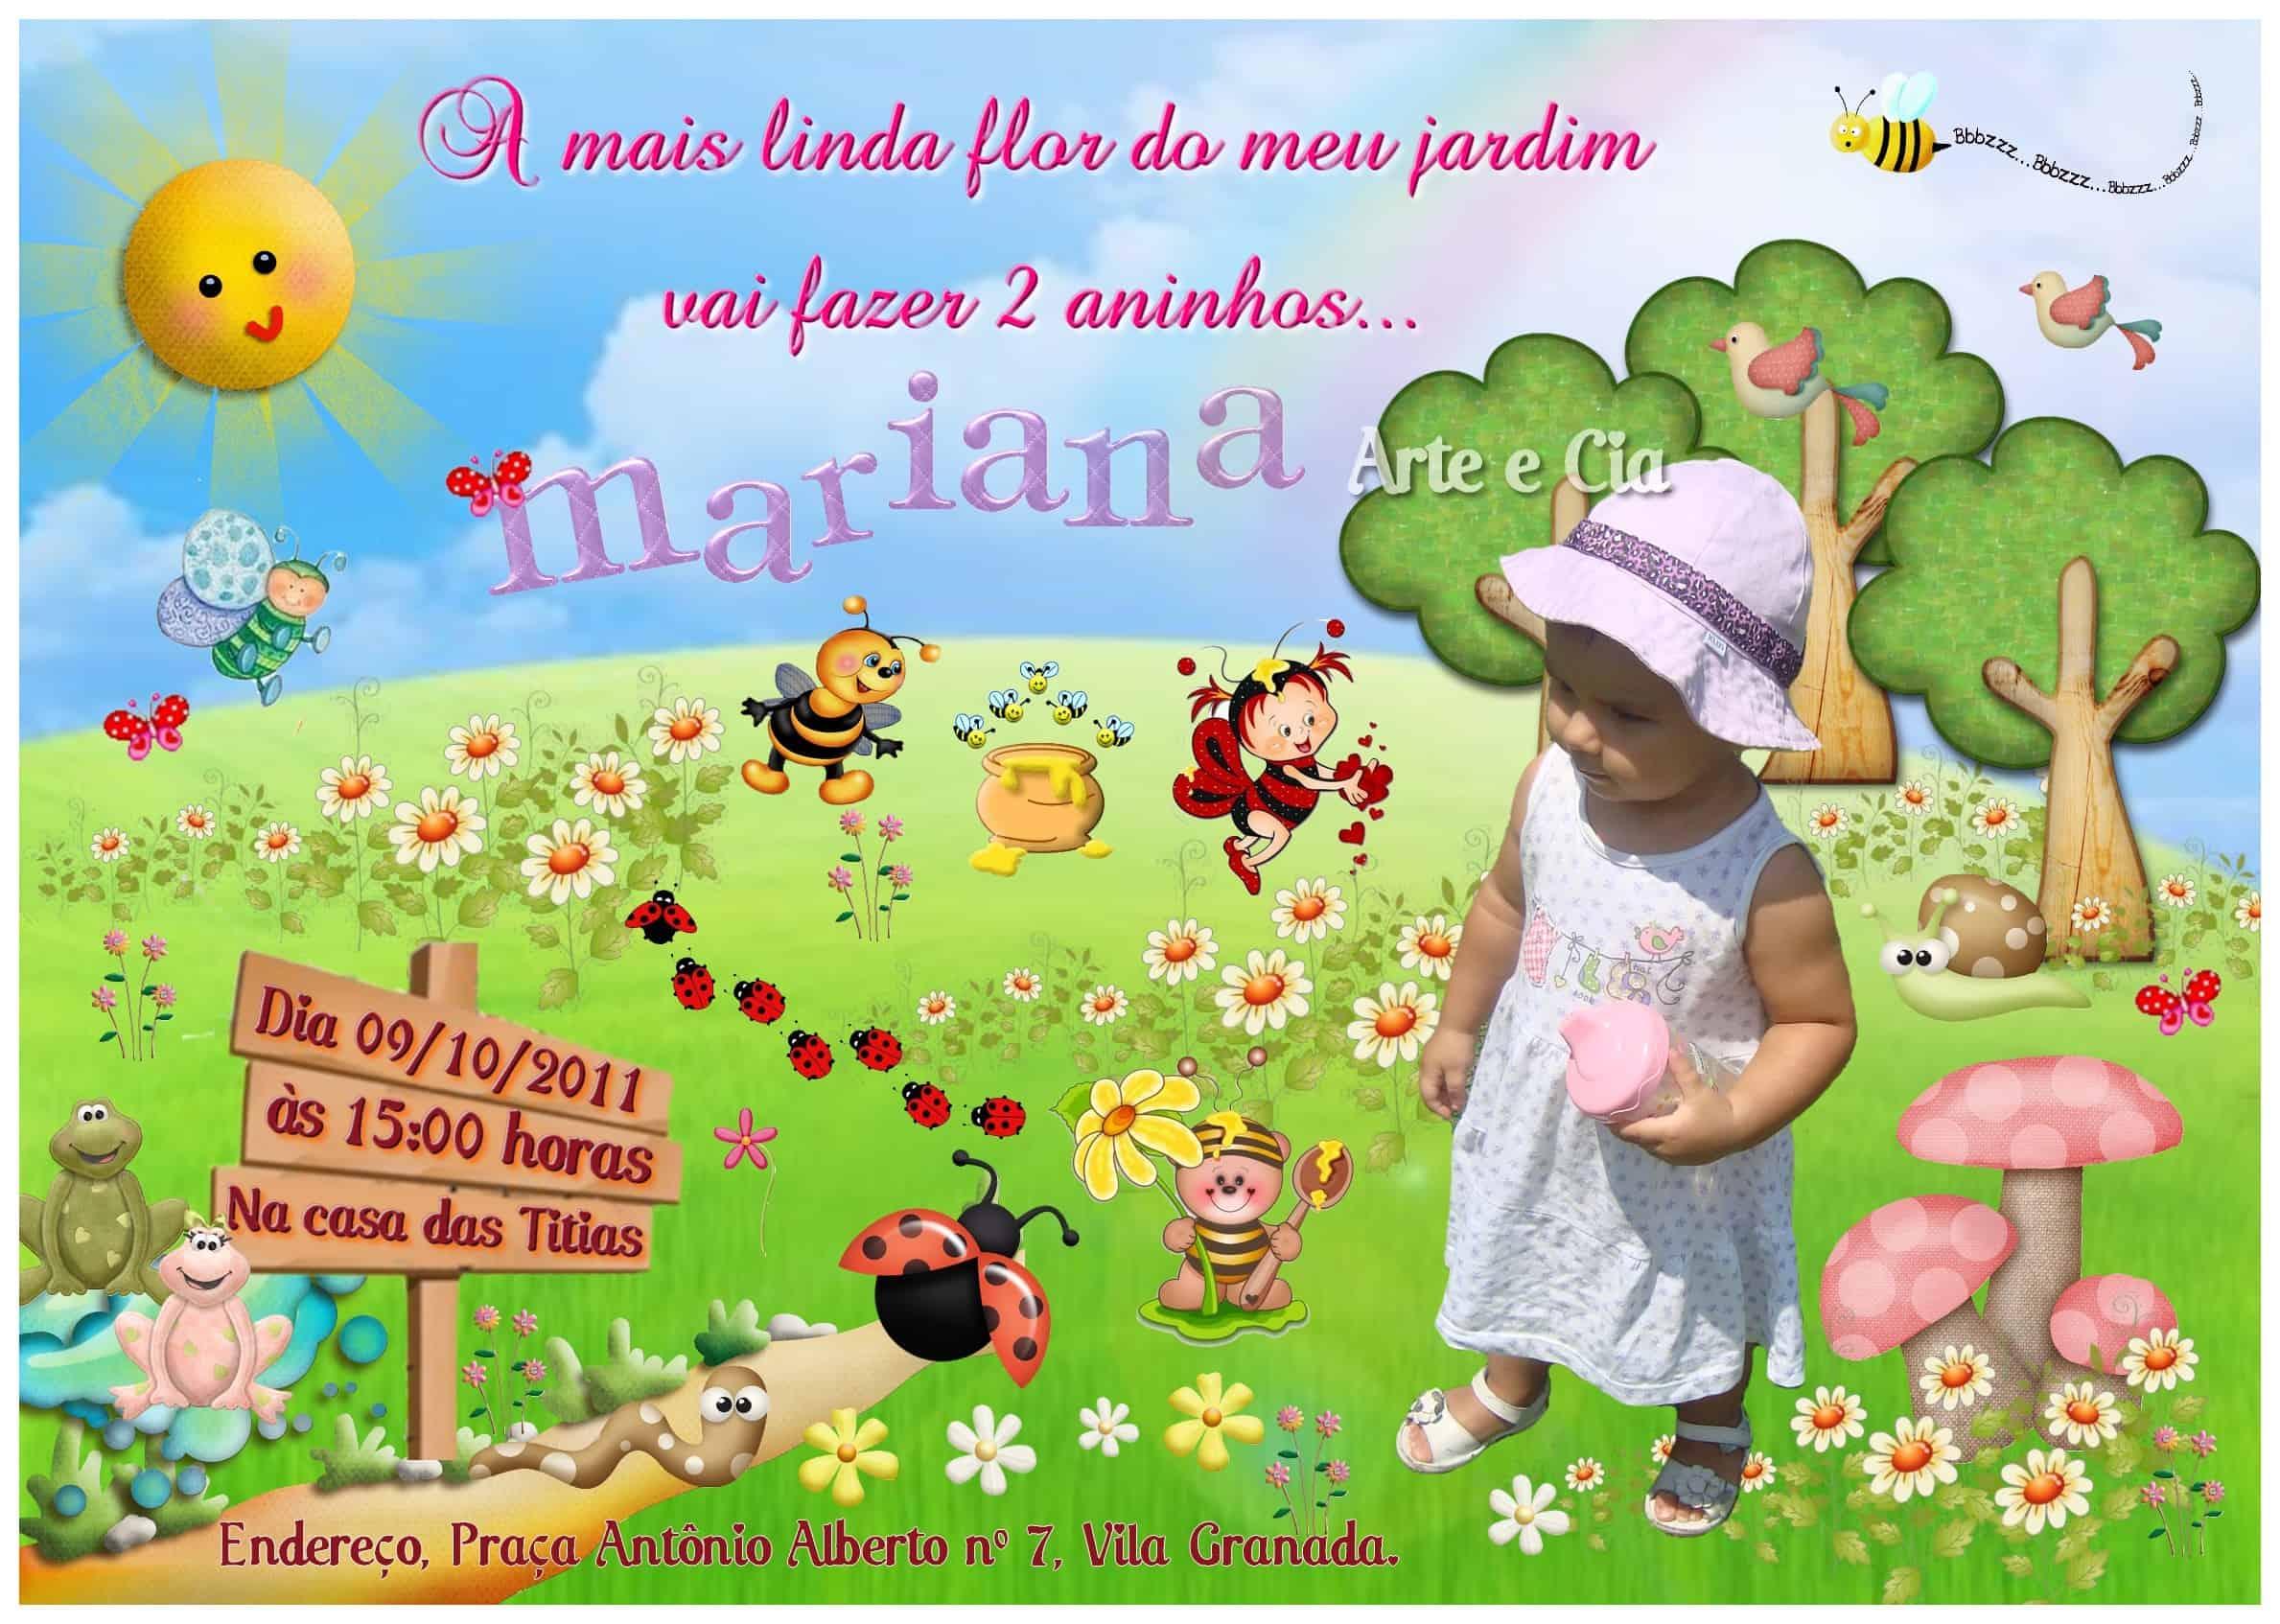 festa jardim convite : festa jardim convite:convite personalizado jardim encantado 1024×729 Festa Jardim Encantado